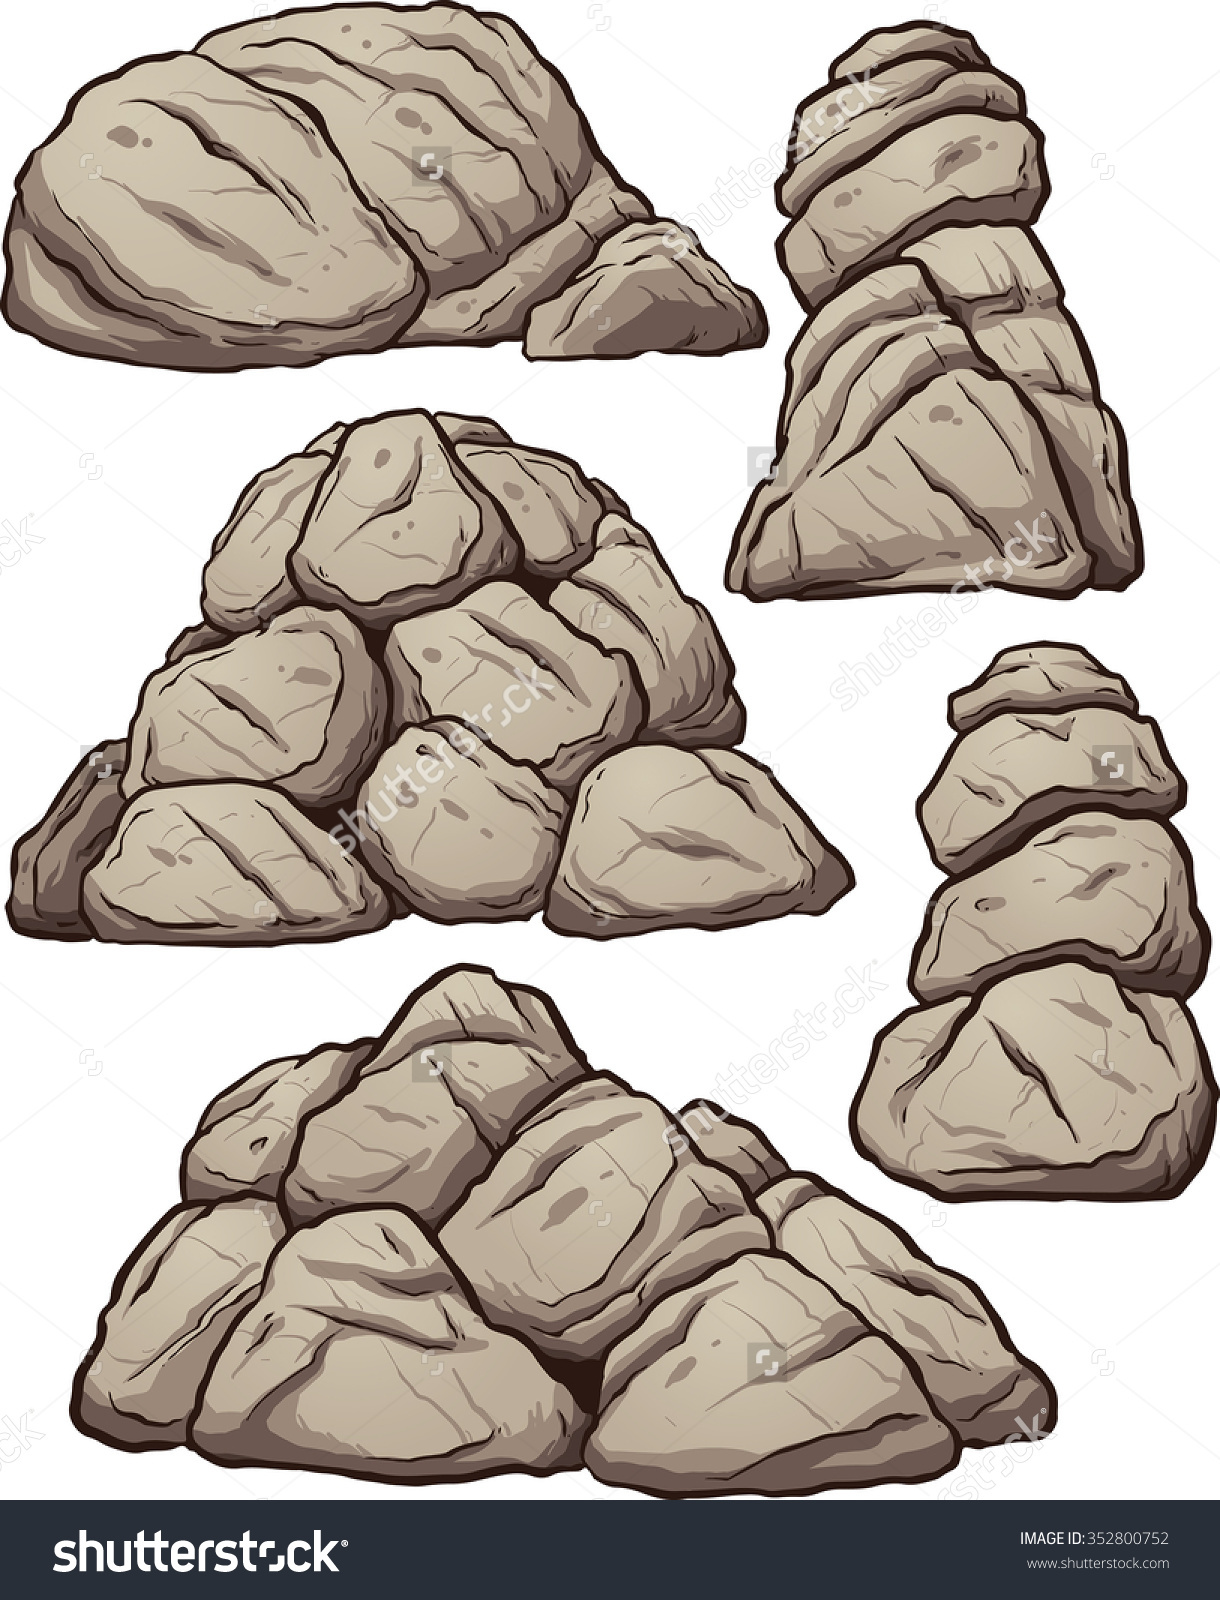 Piles of rocks. Vector clip art illustra-Piles of rocks. Vector clip art illustration with simple gradients. Each pile on a-18